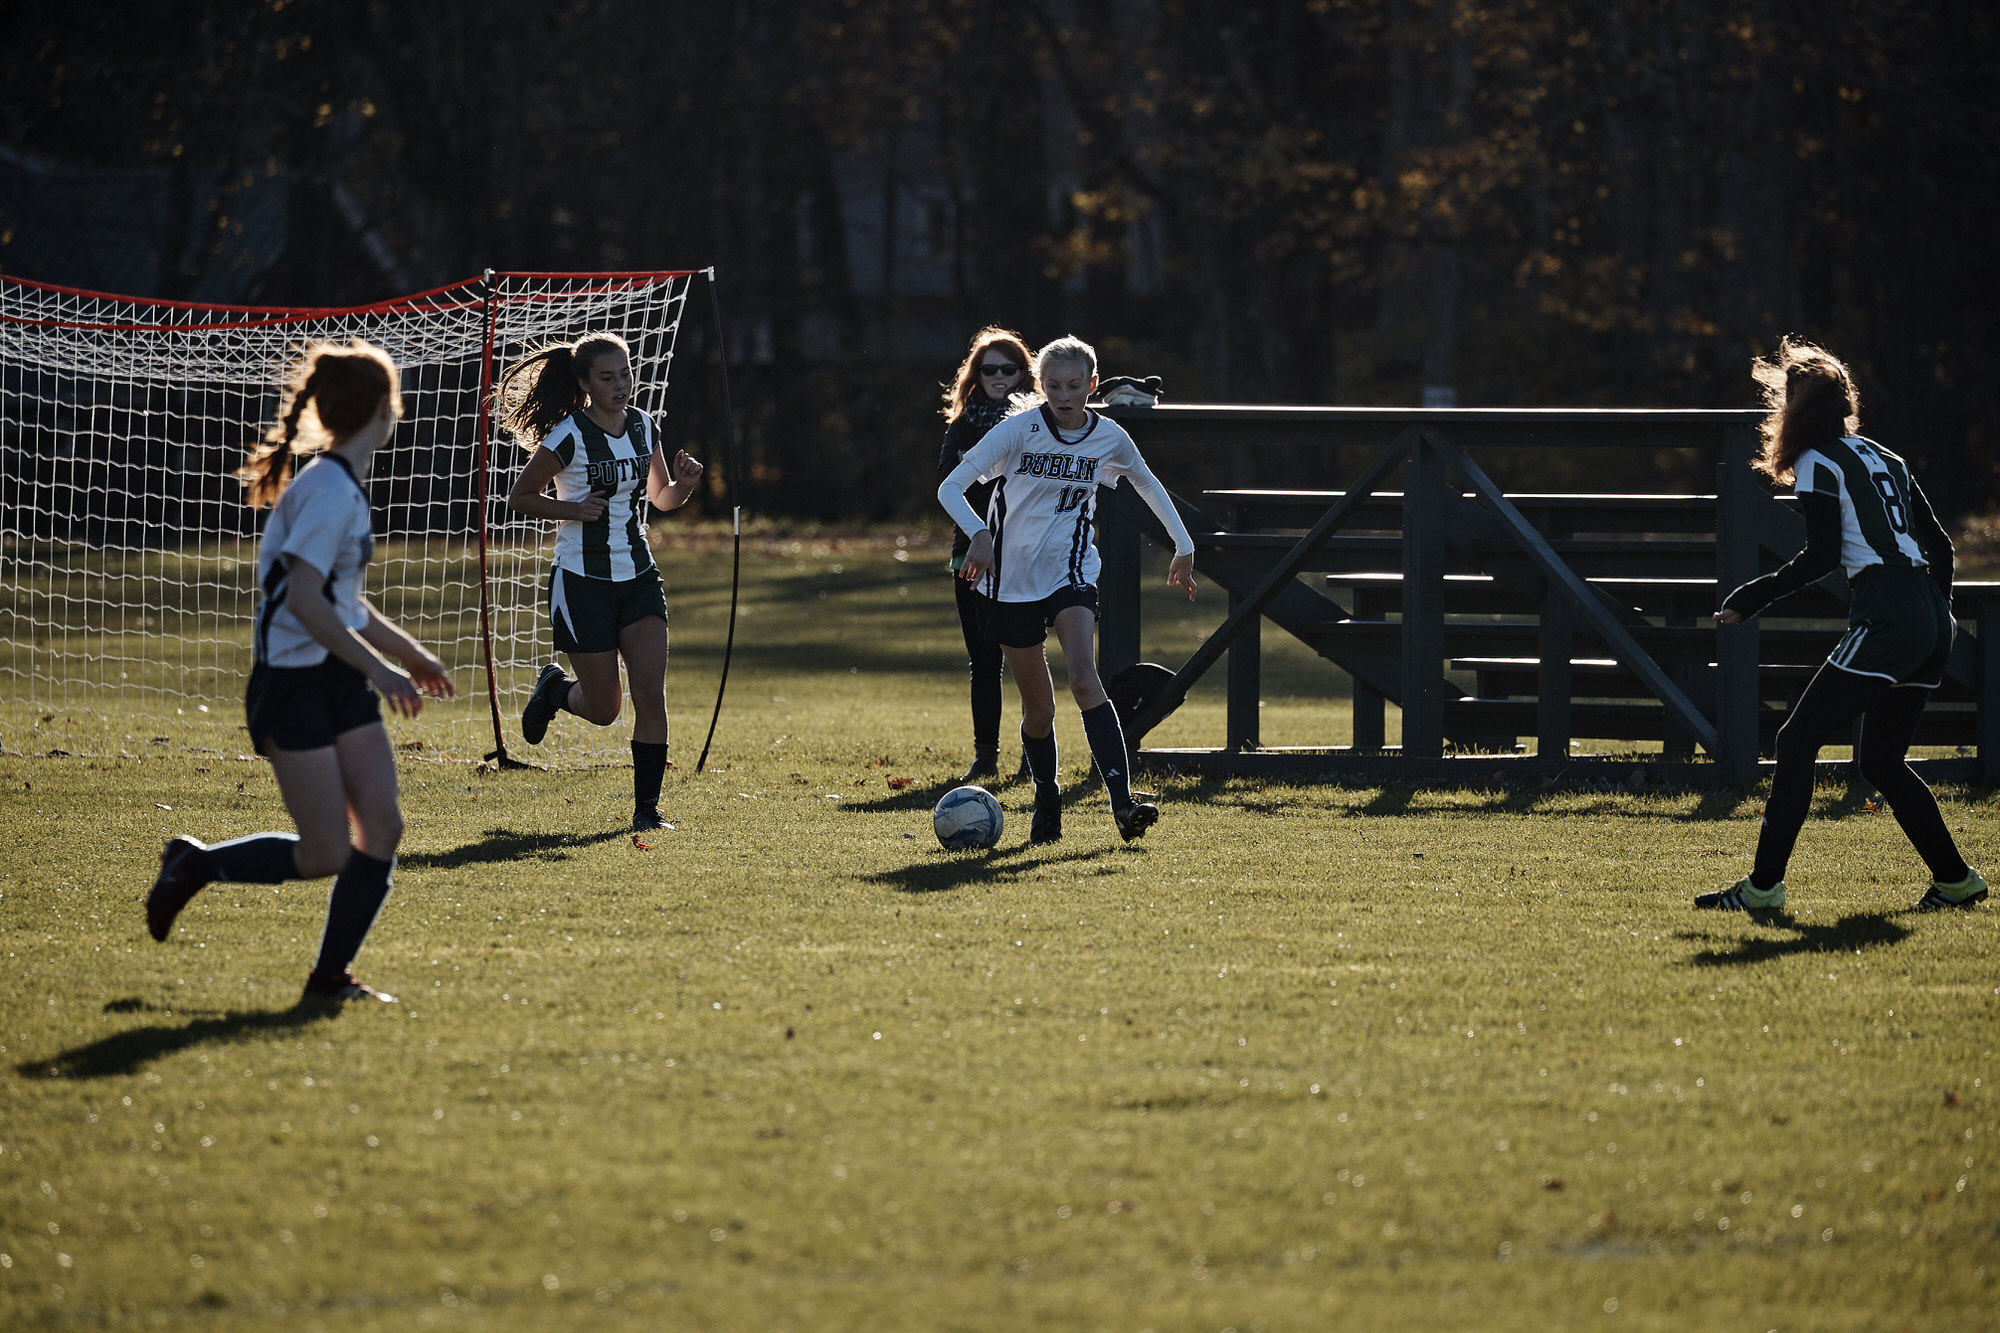 Girls Varsity Soccer vs. Putney School - October 26, 2018 - 031.jpg